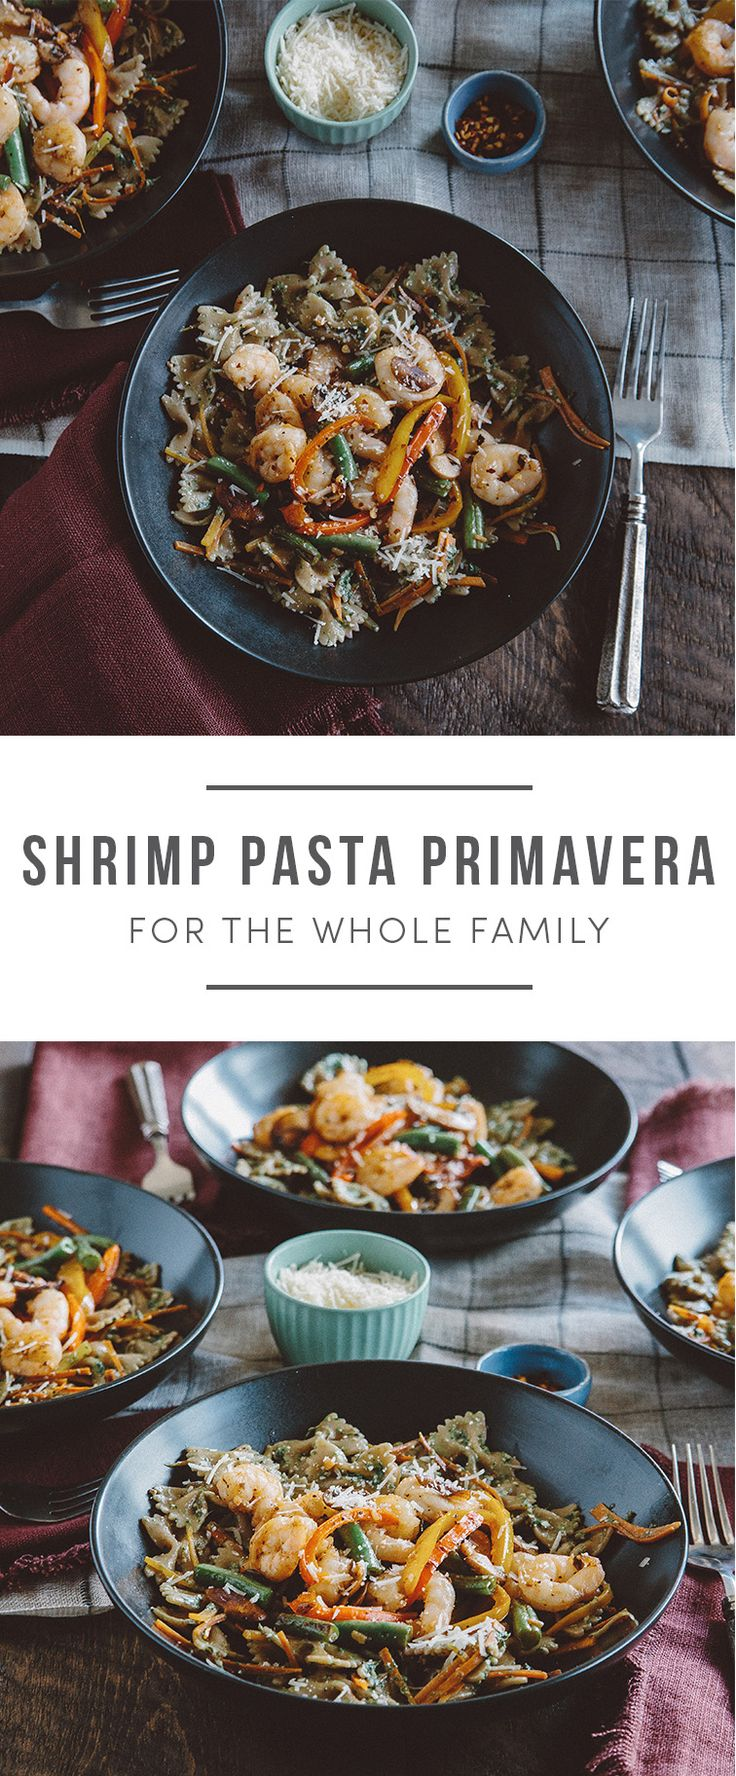 17 Best Ideas About Shrimp Primavera On Pinterest Shrimp Spaghetti Pasta Primavera And Shrimp